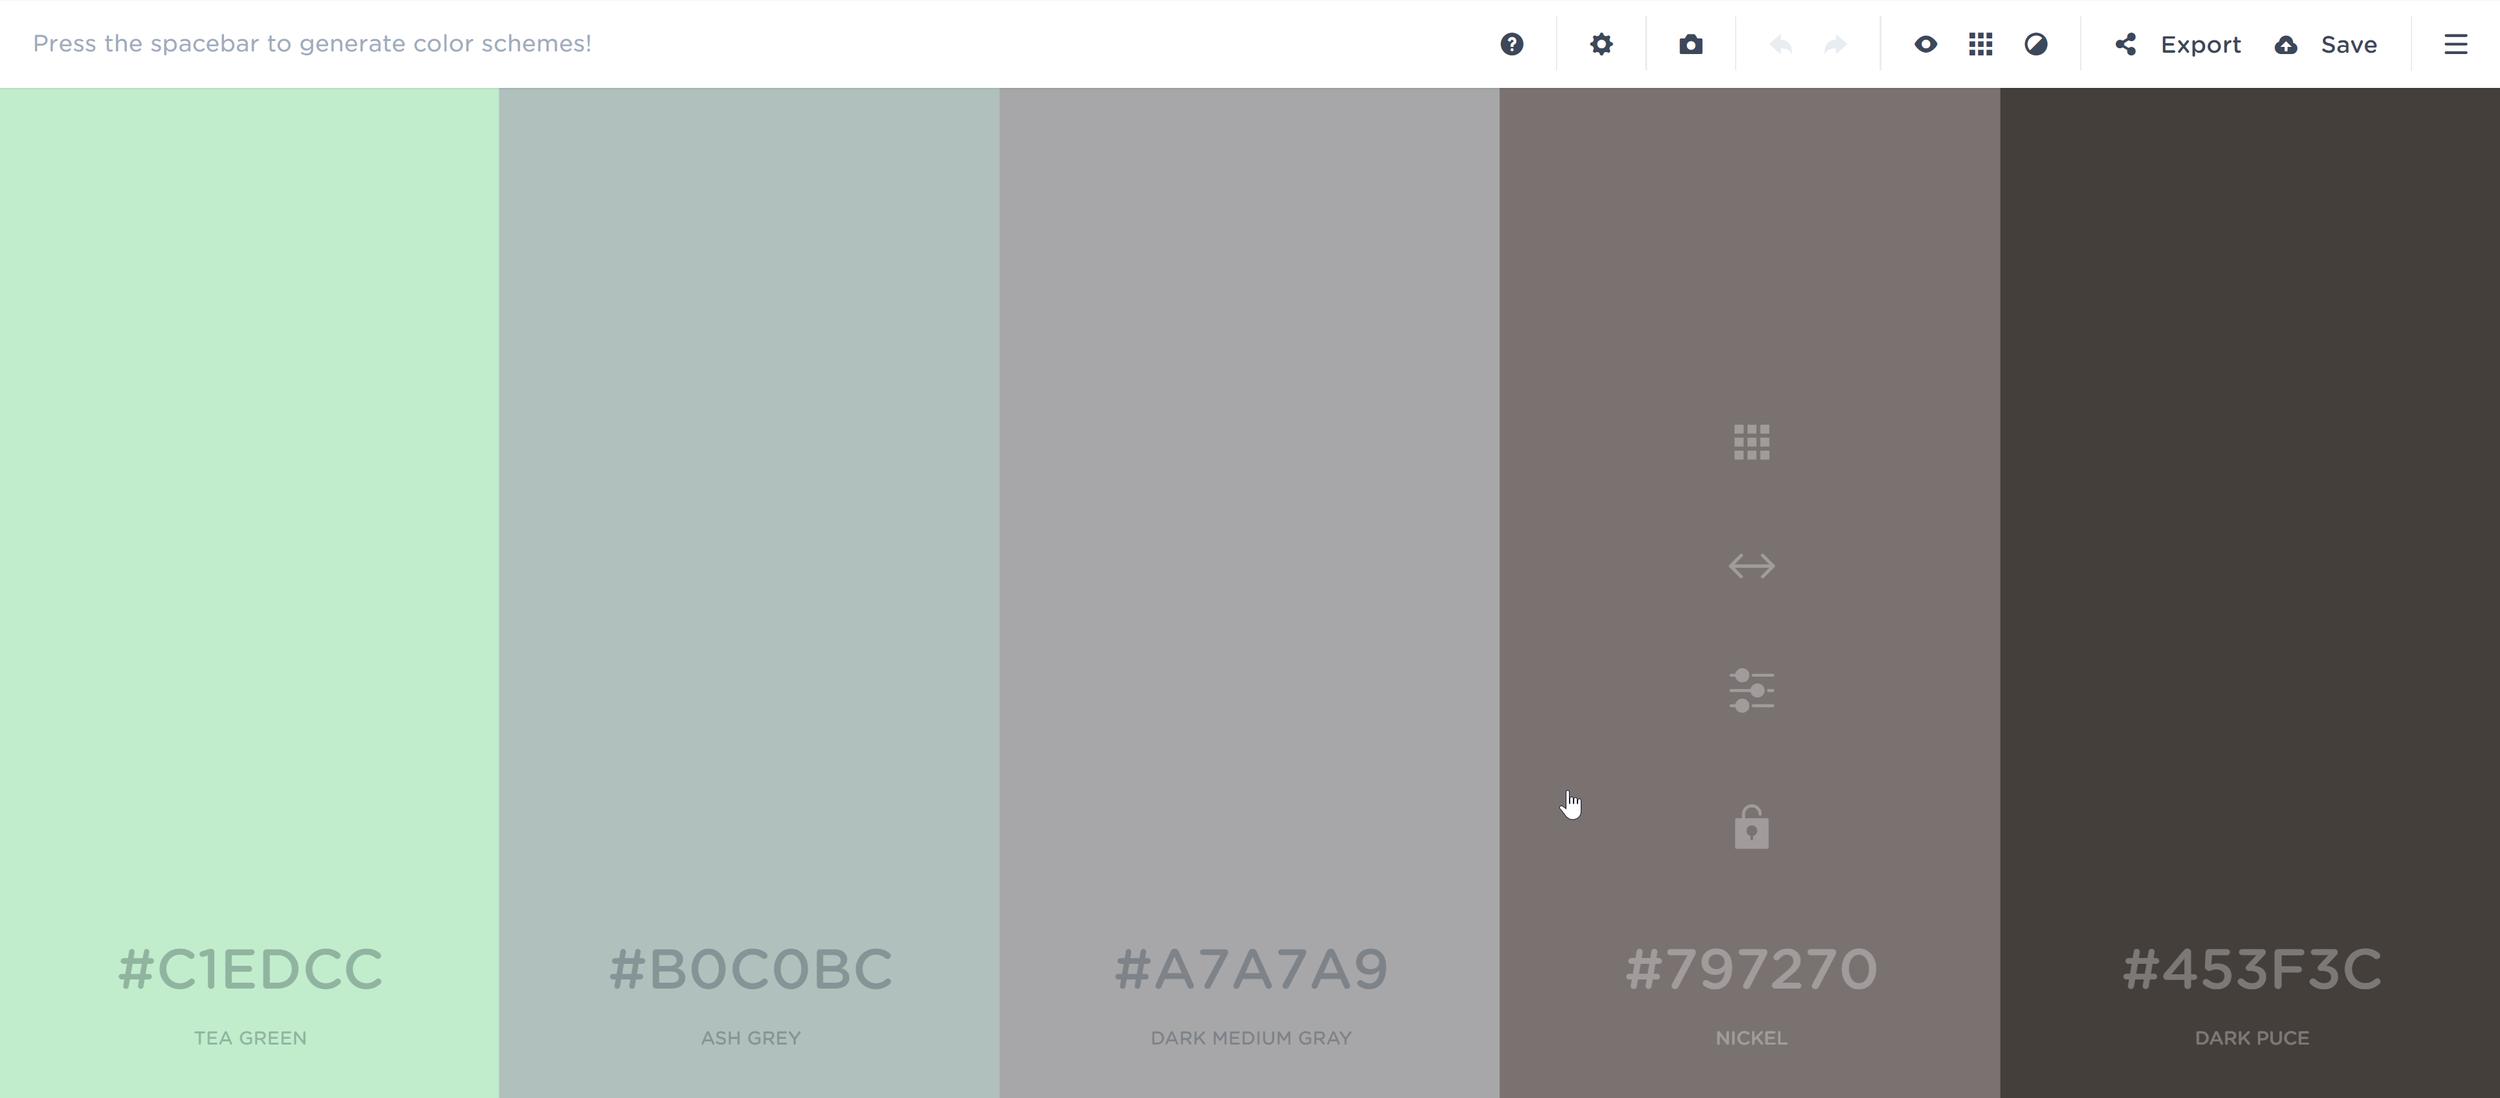 Space through random palettes - Save your favorites